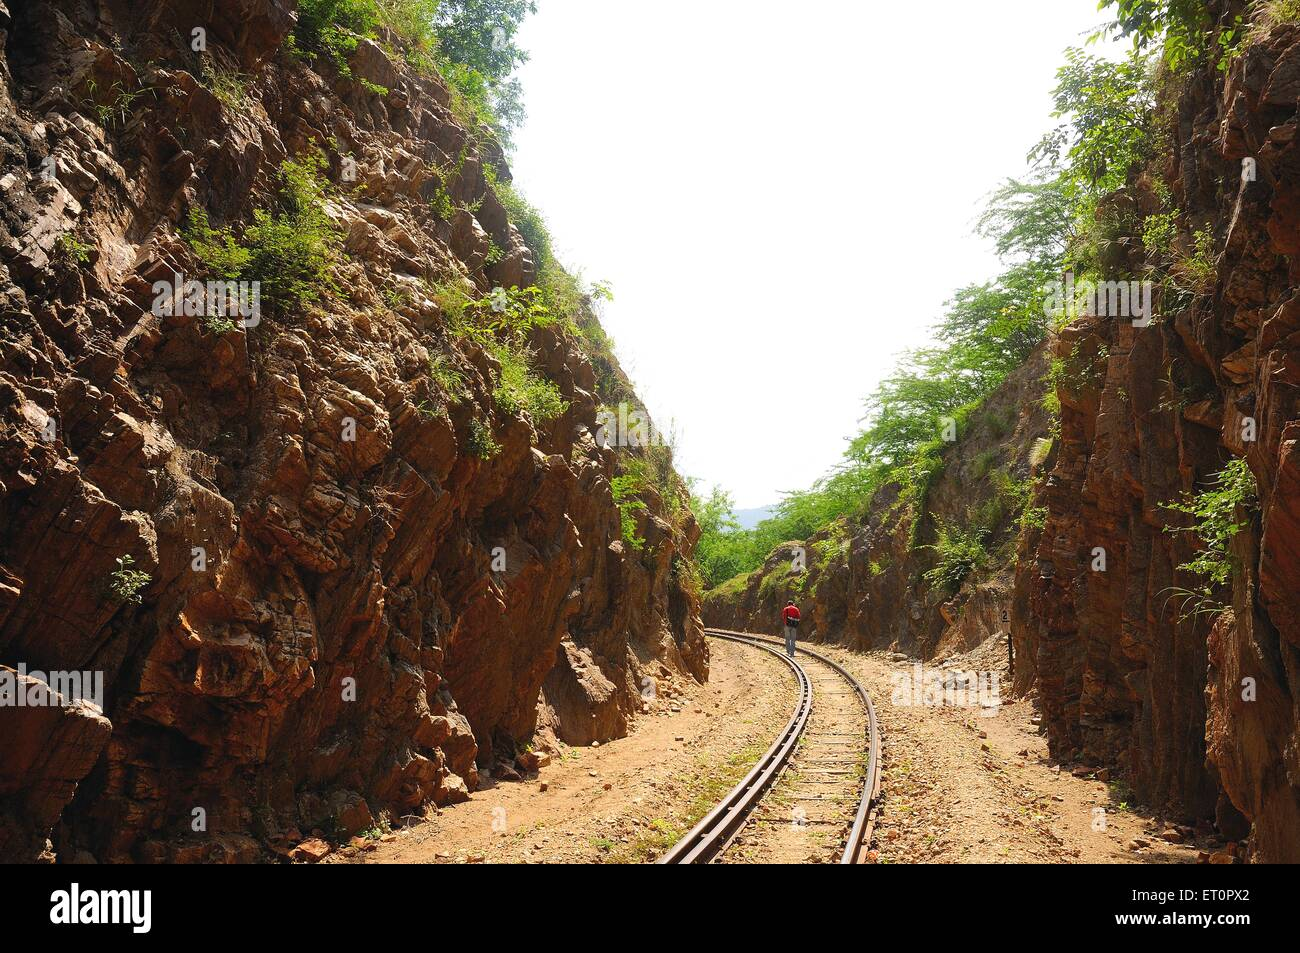 Railway line ; Goram ghat ; Marwar Junction ; Rajasthan ; India - Stock Image